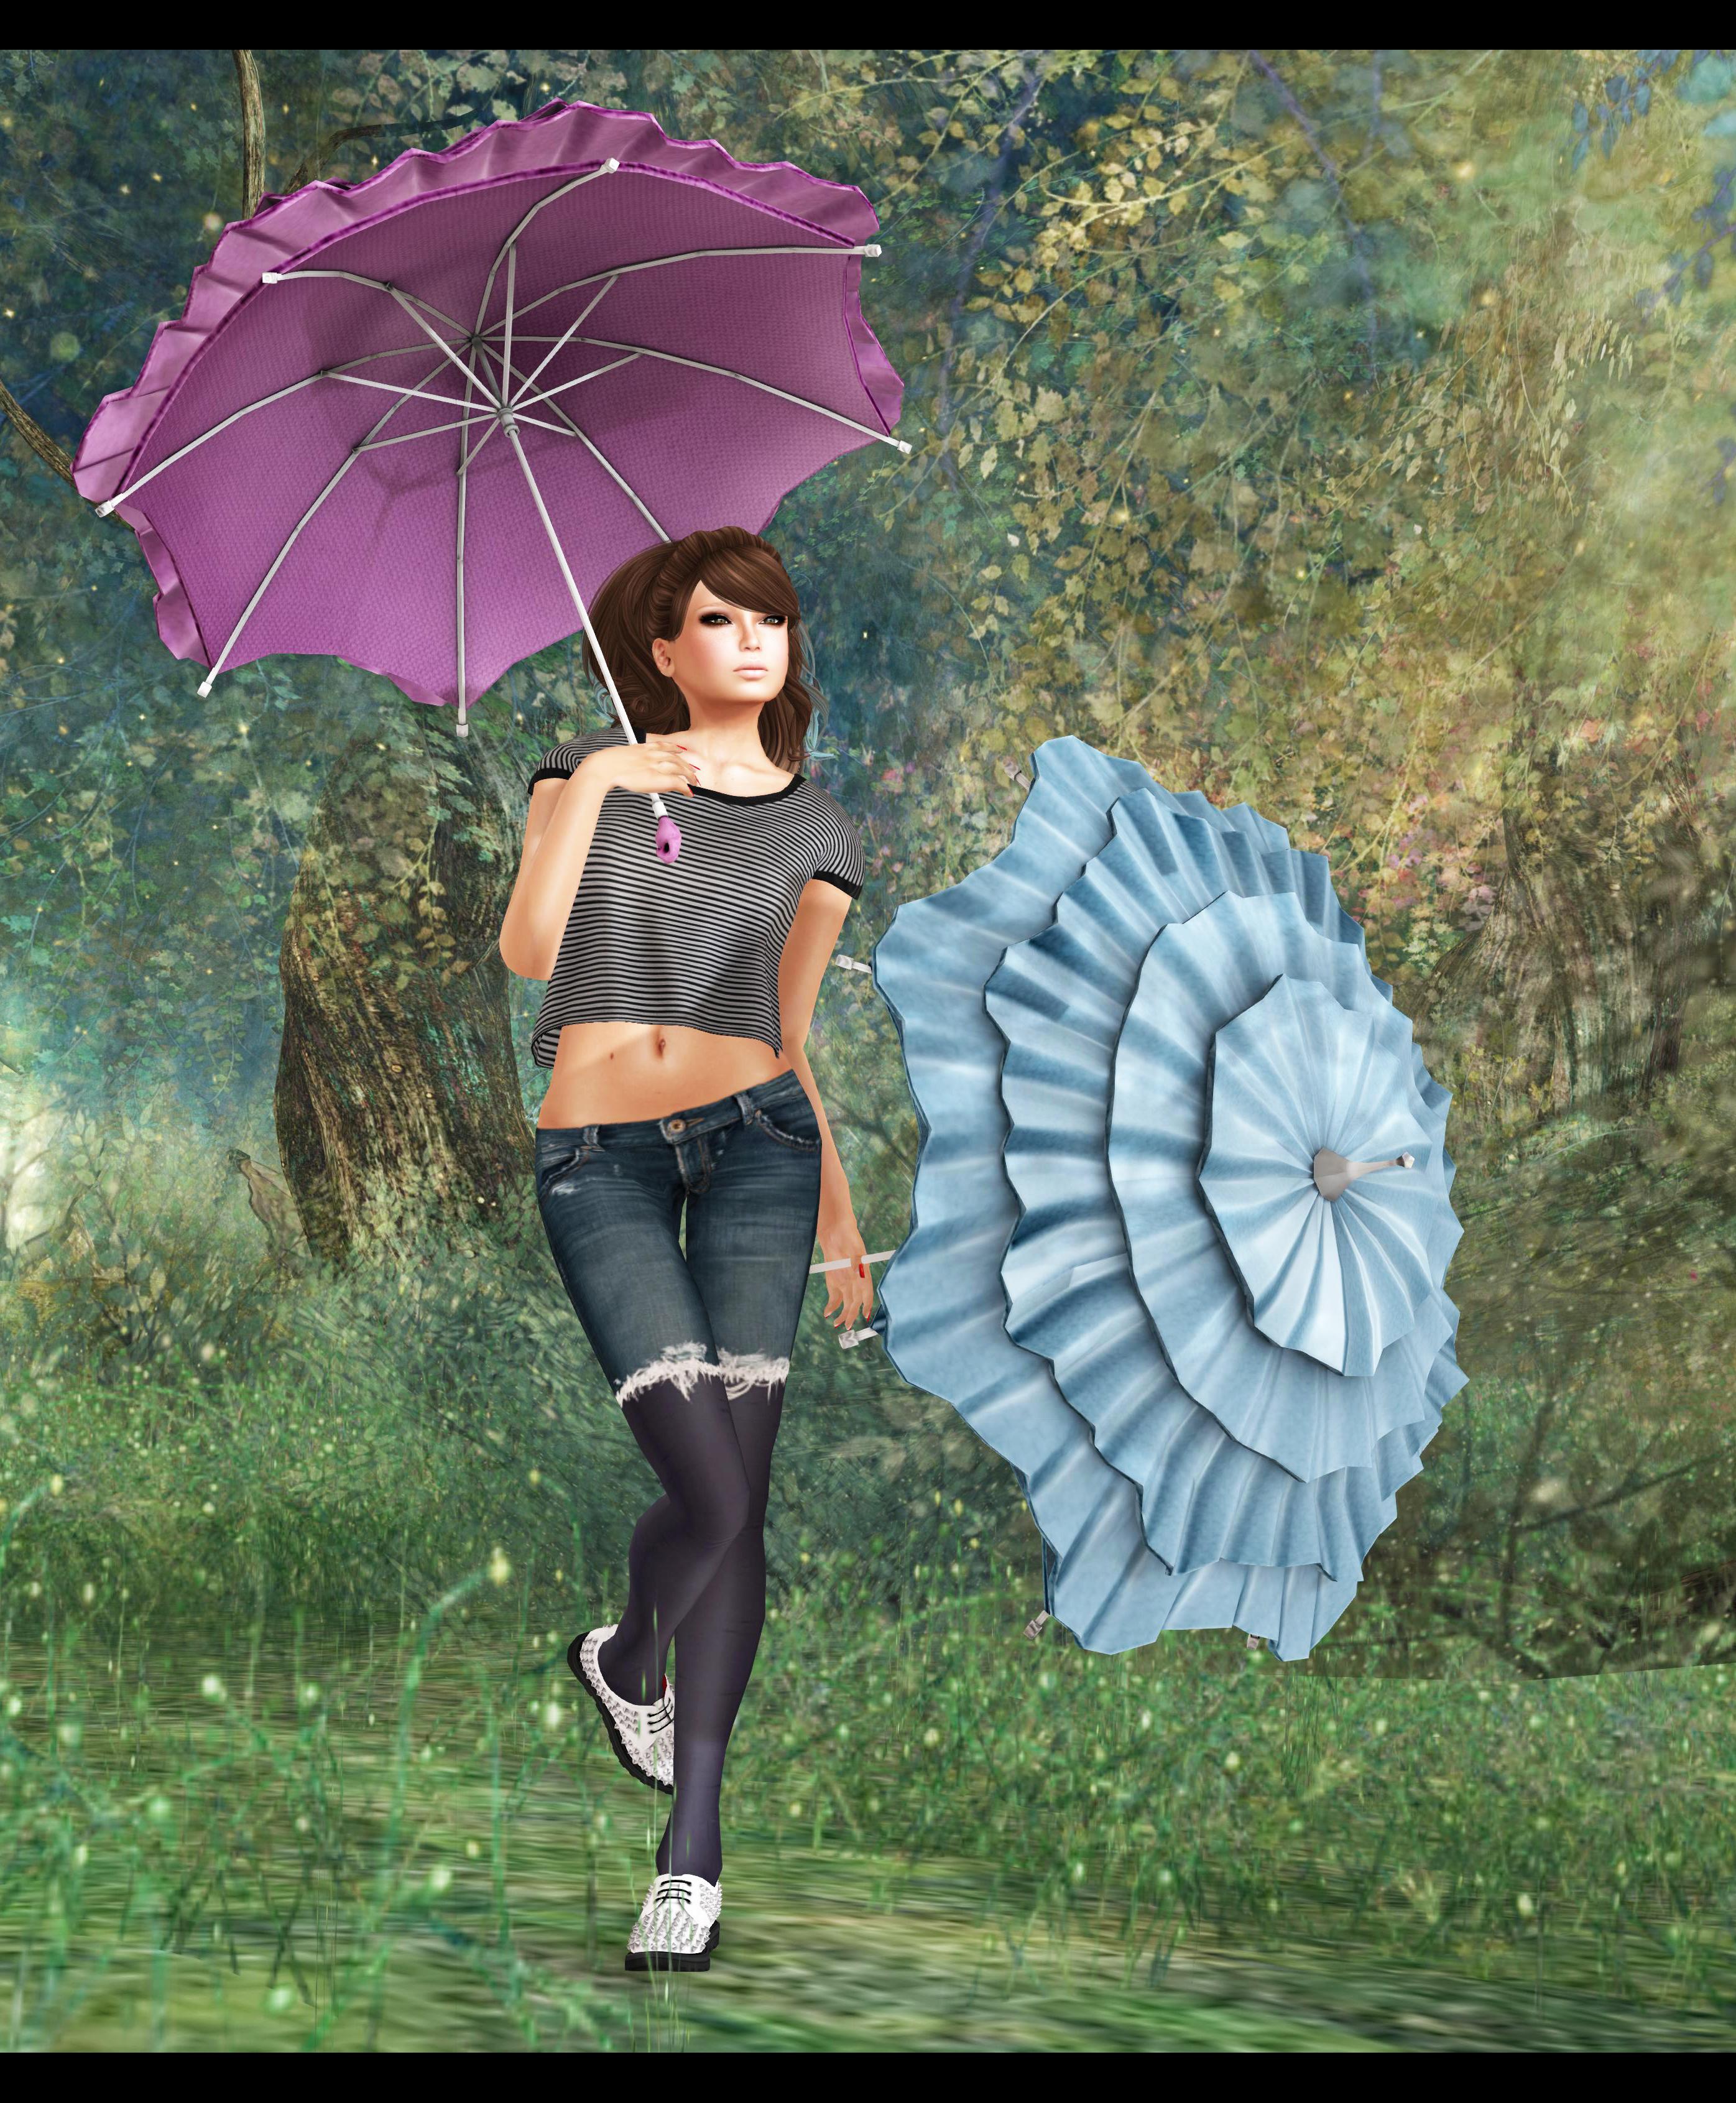 April May Bring Showers 2